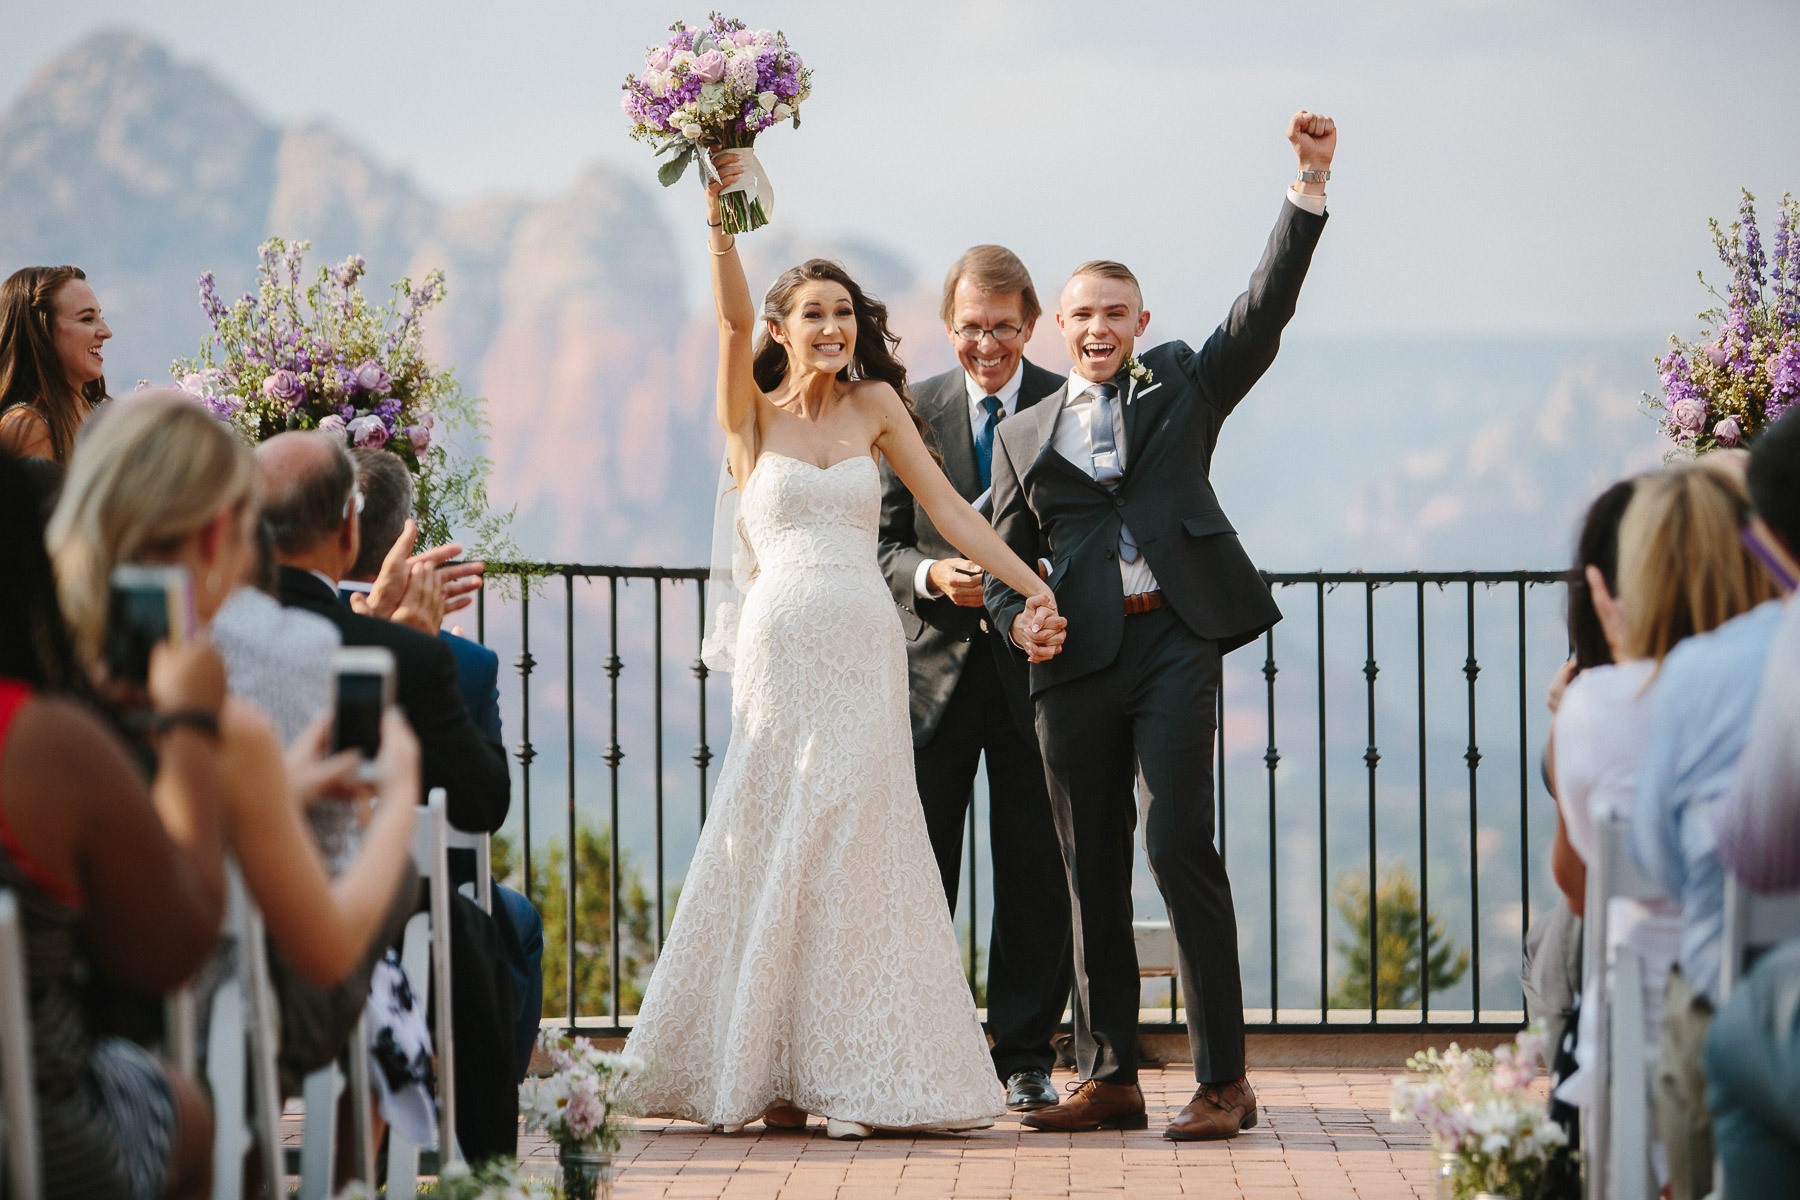 170528-Malkin-Wedding-Sedona-Arizona-Wedding-Photography-Sky-Ranch-Lodge-1023.jpg